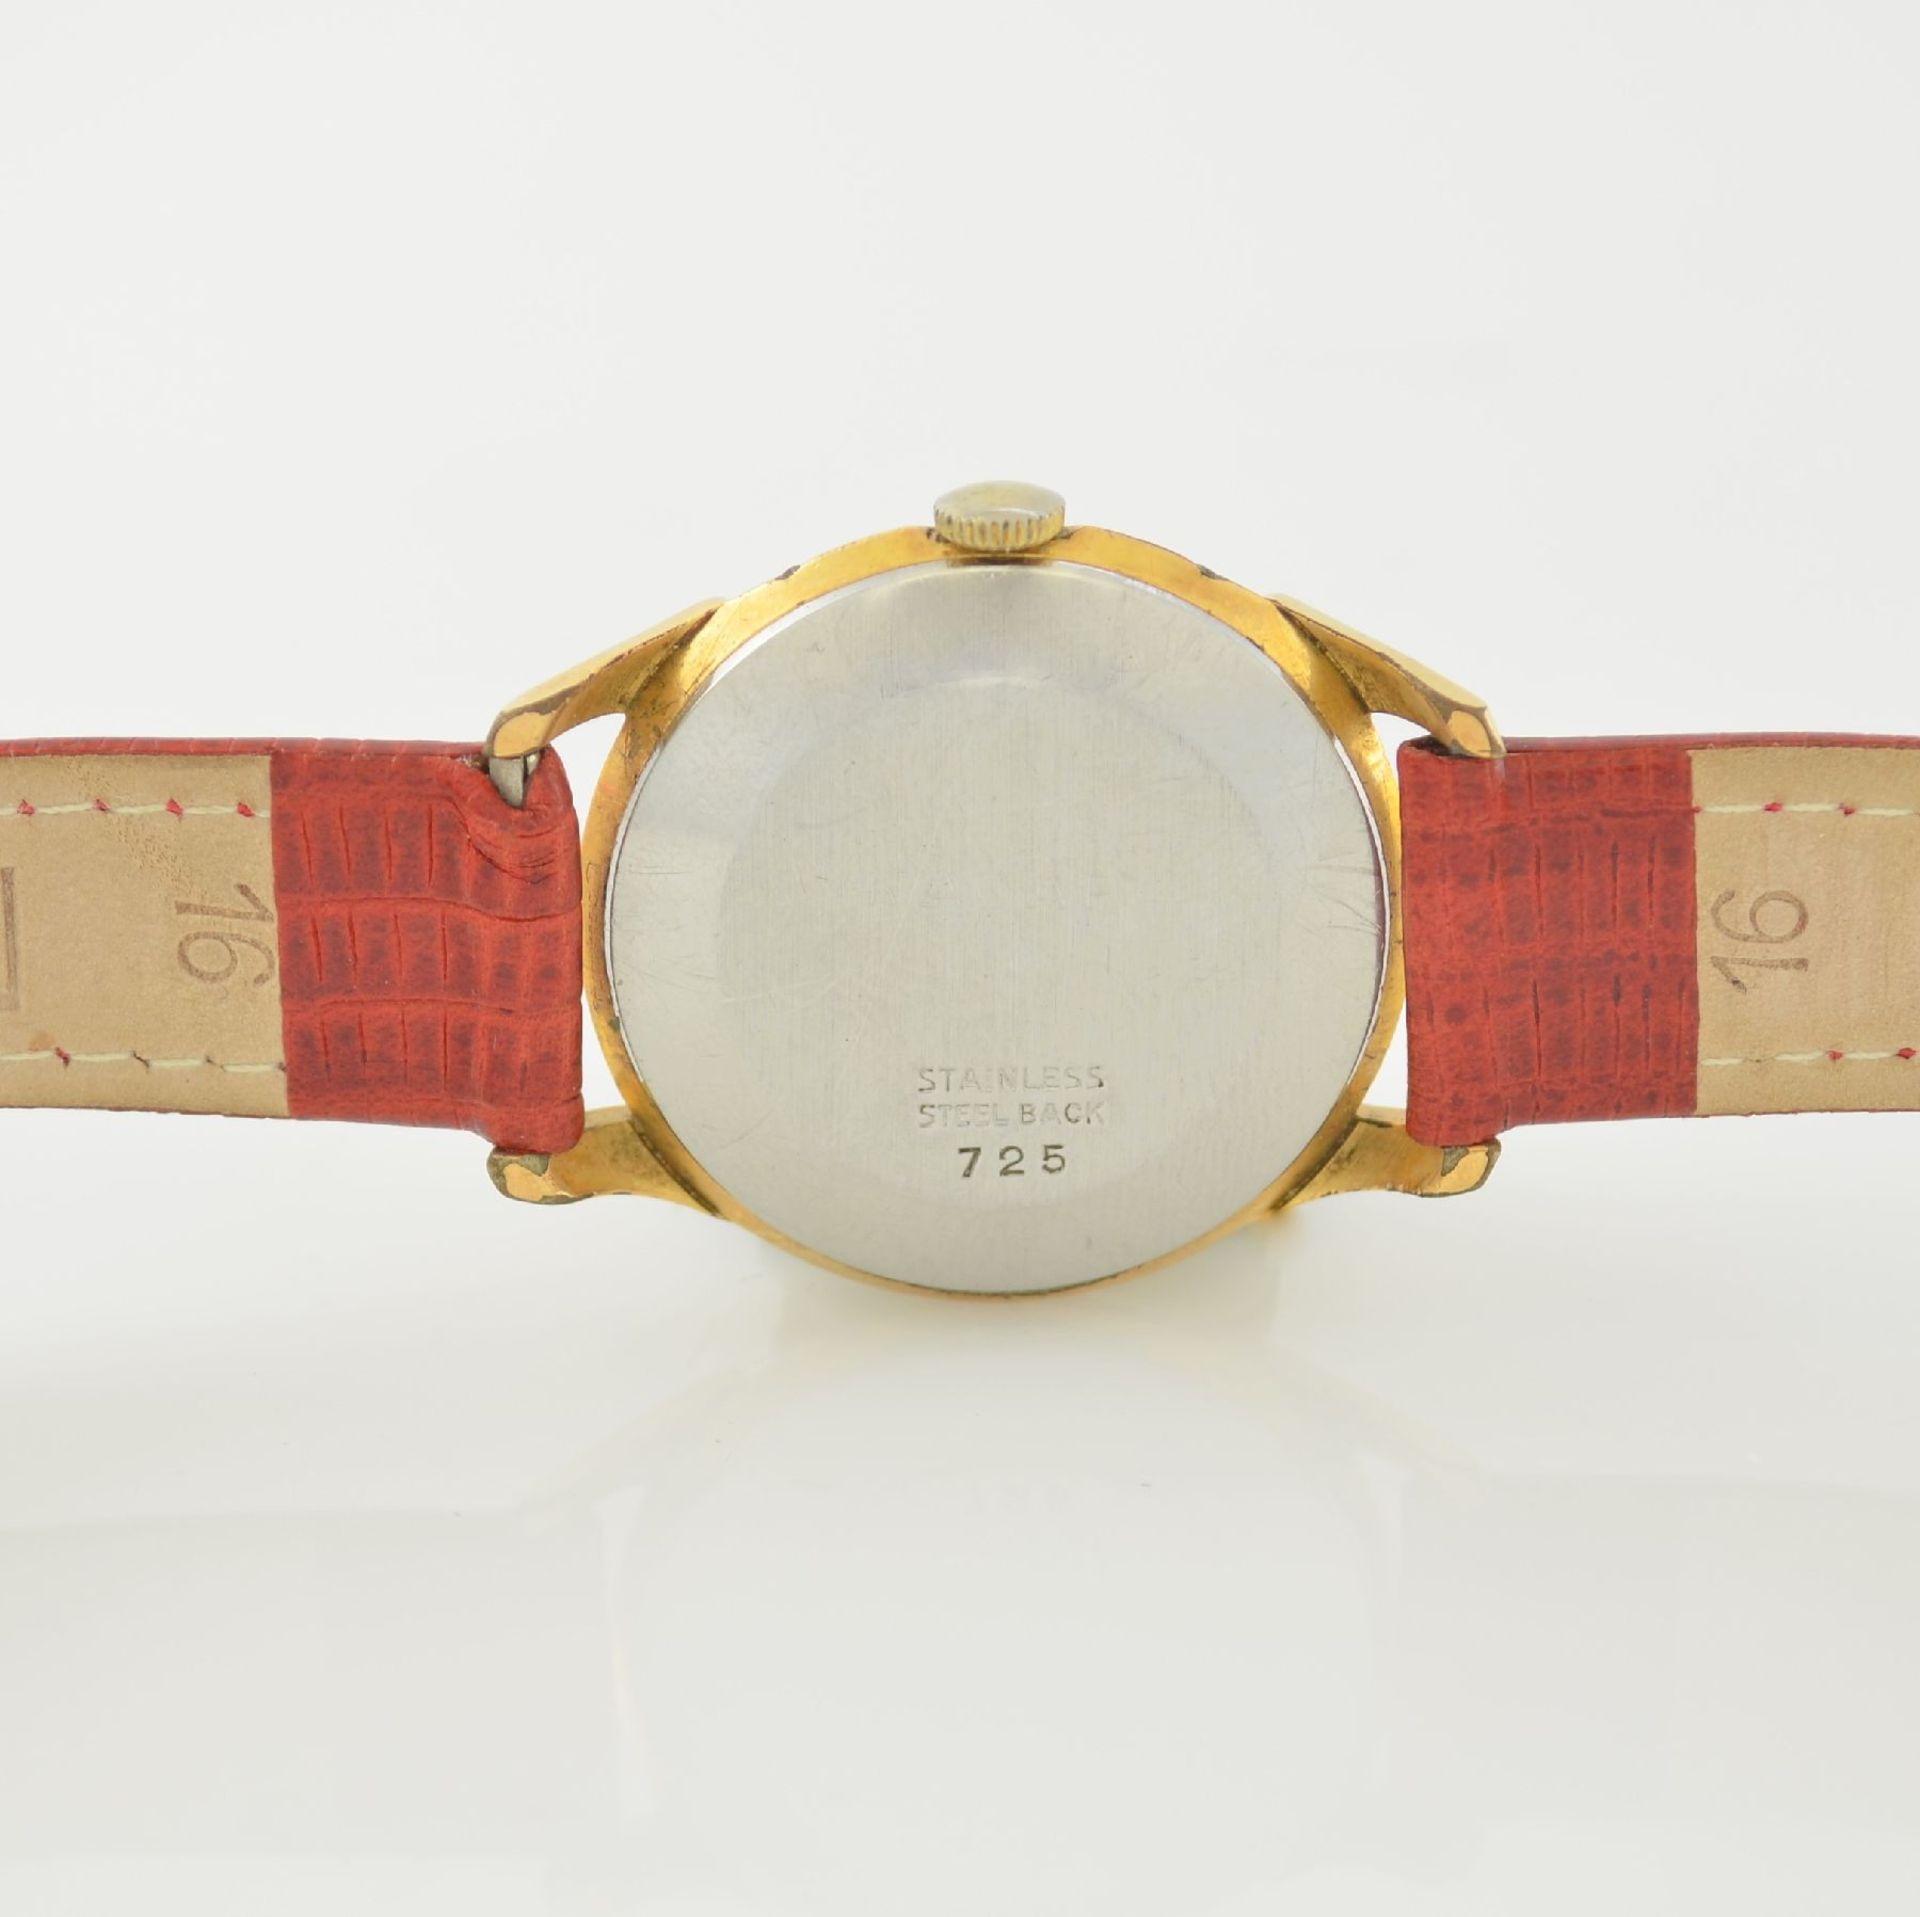 Konvolut: 2 Armbanduhren mit Kalender bzw. Datum, Schweiz um 1950-1960, Handaufzug, 1) NACAR m. - Bild 6 aus 12